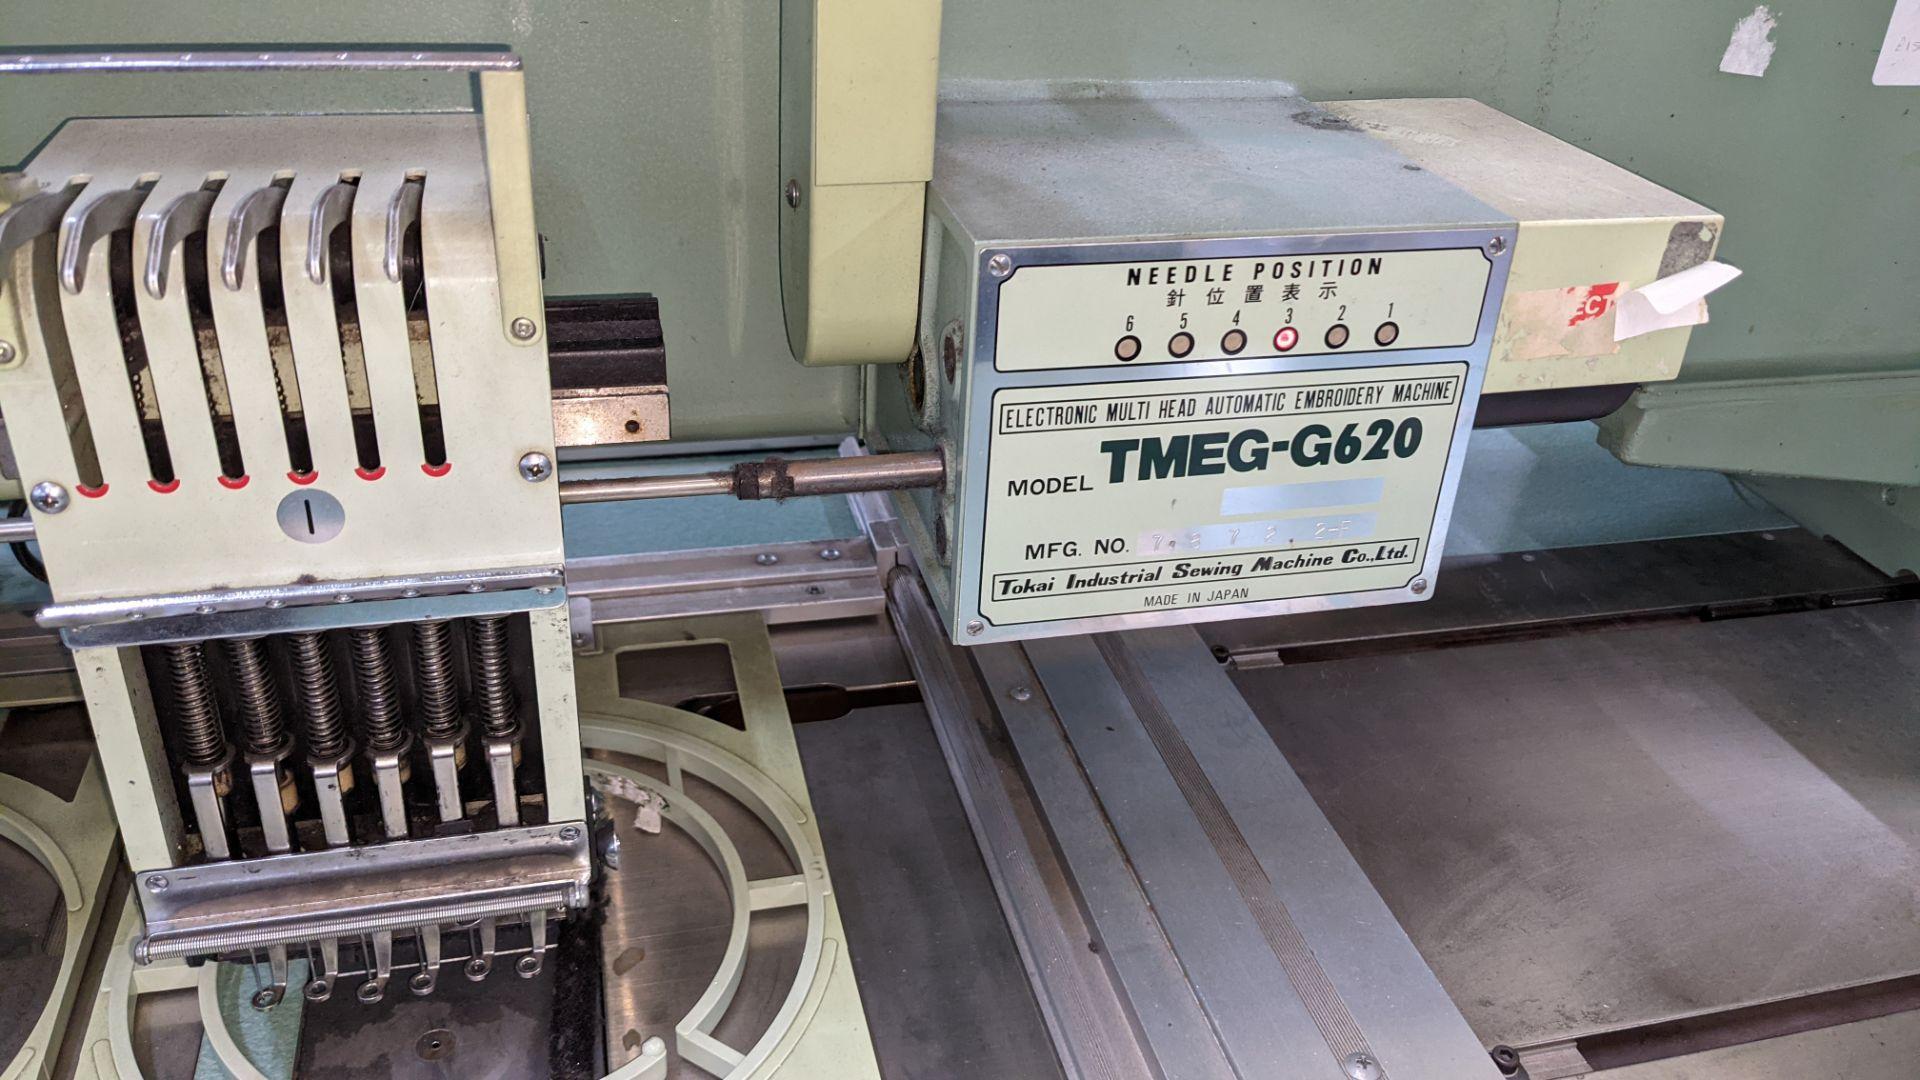 Tokai Tajima electronic 20 head automatic embroidery machine model TMEG-G620, manufacturing number 7 - Image 16 of 19